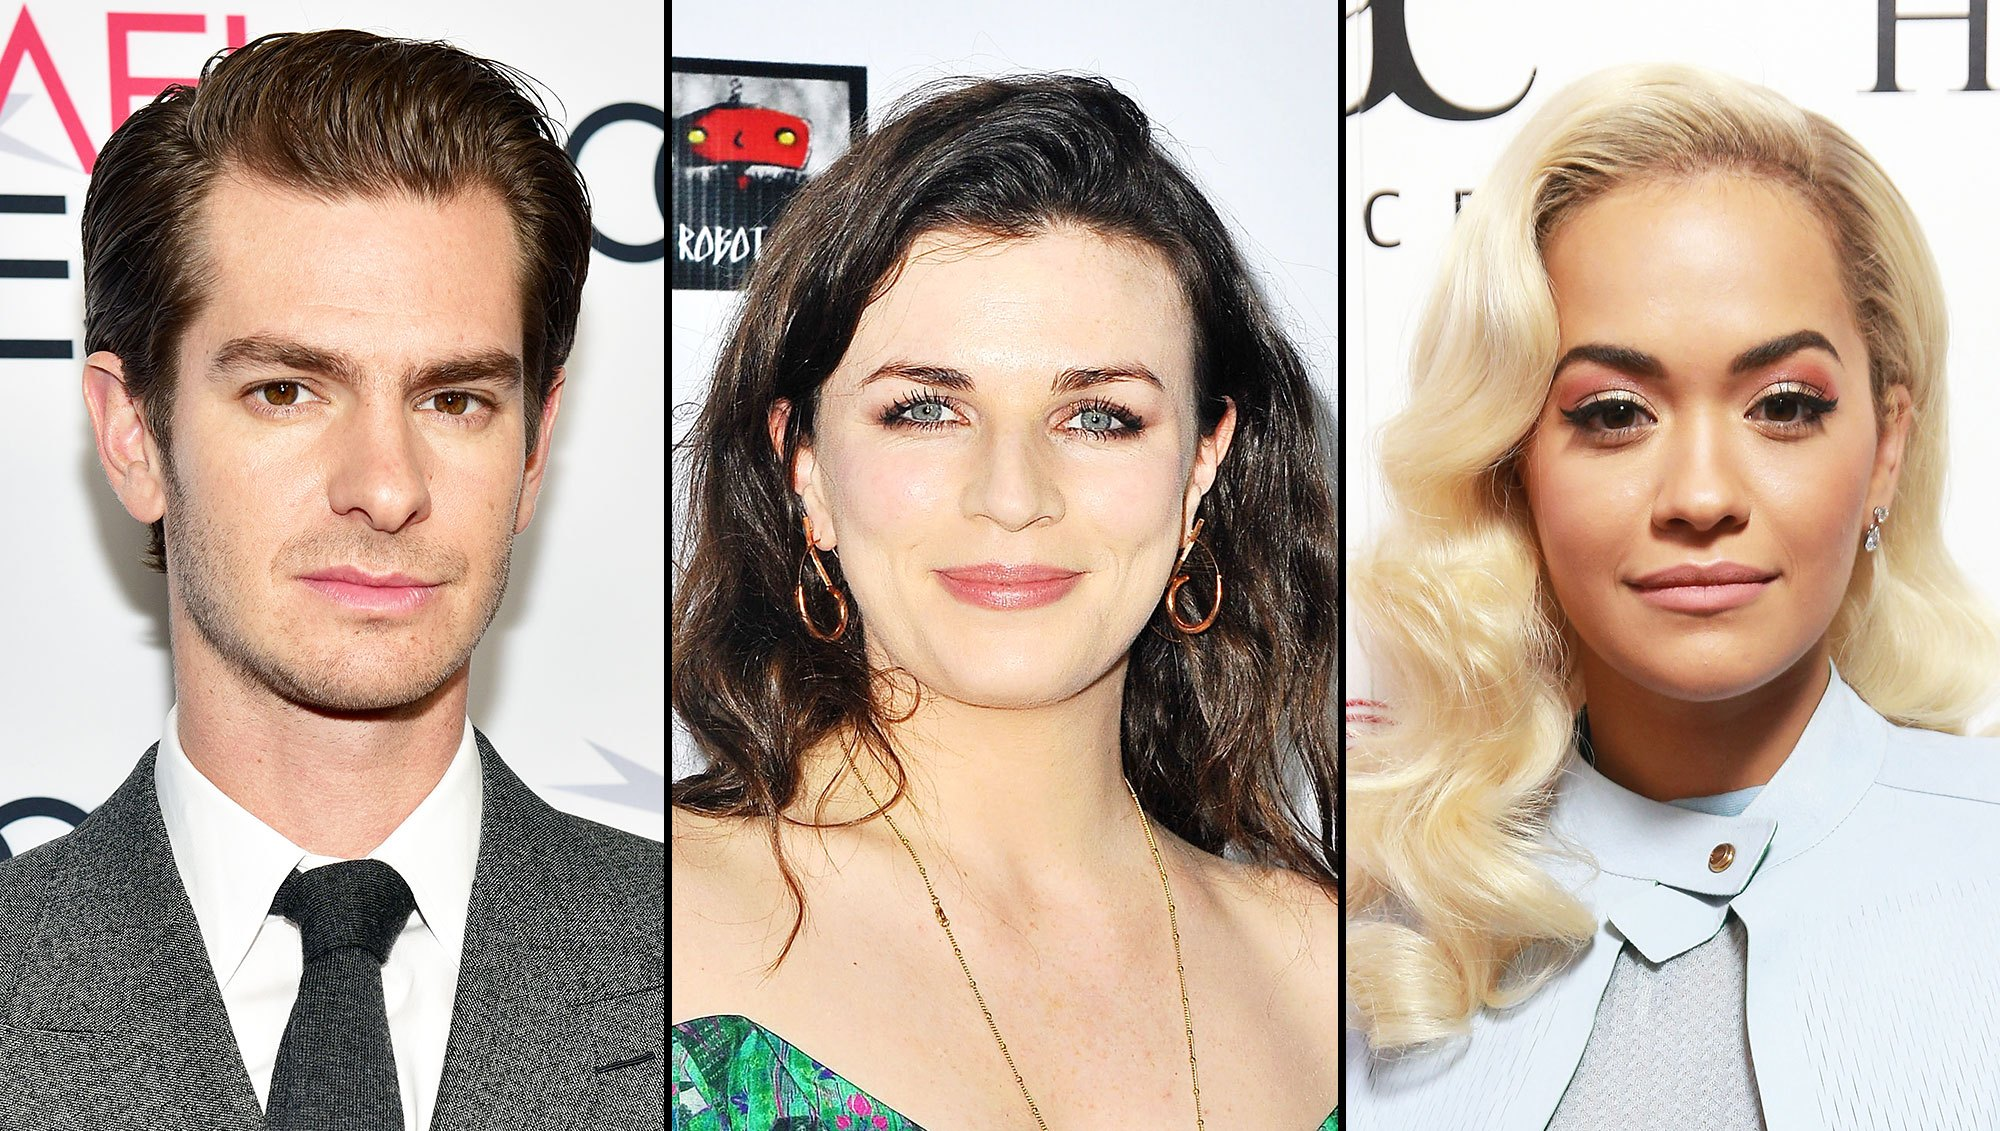 Andrew Garfield Cozy Aisling Bea Rita Ora Split